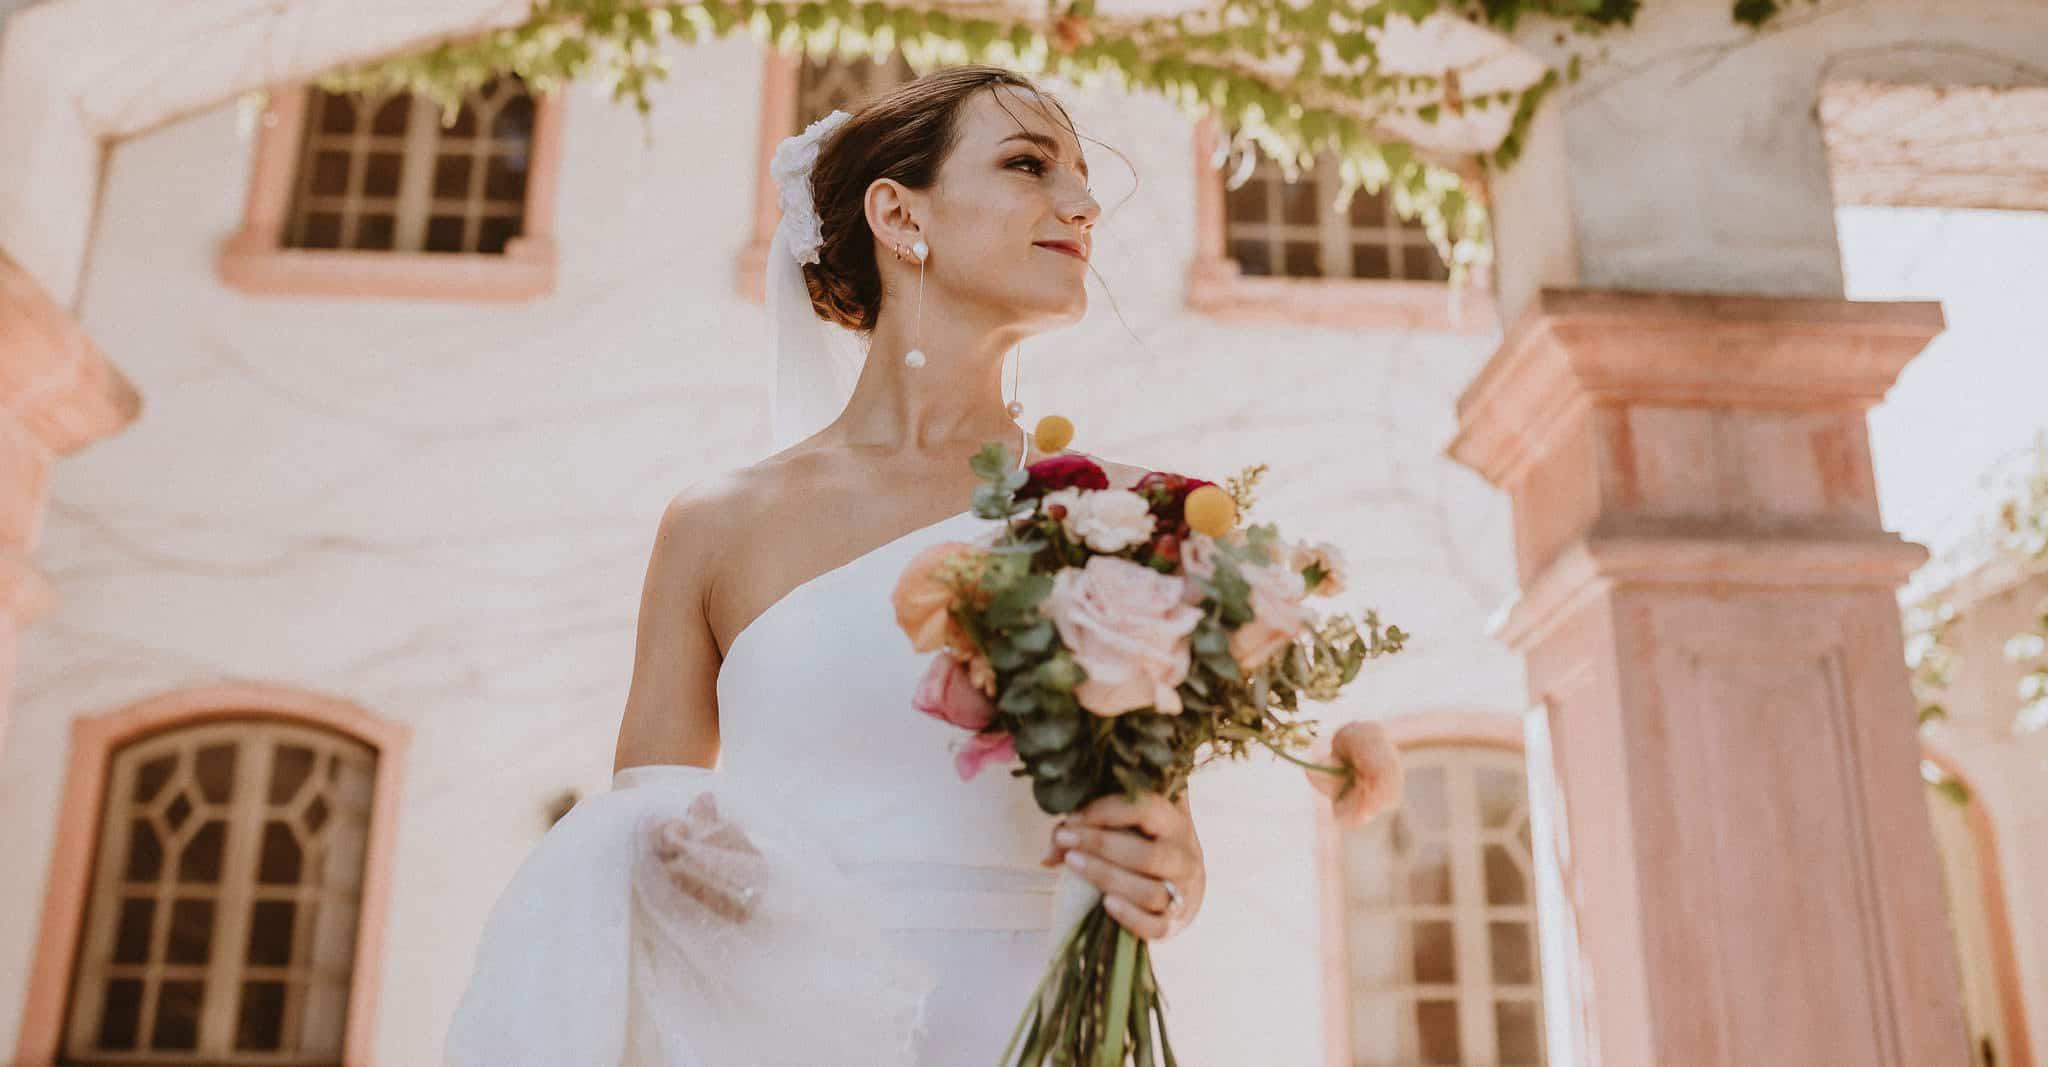 Conversemos de tu Matri. Fotografia de Matrimonio. Cata en su día de matrimonio en Viña Tarapaca.